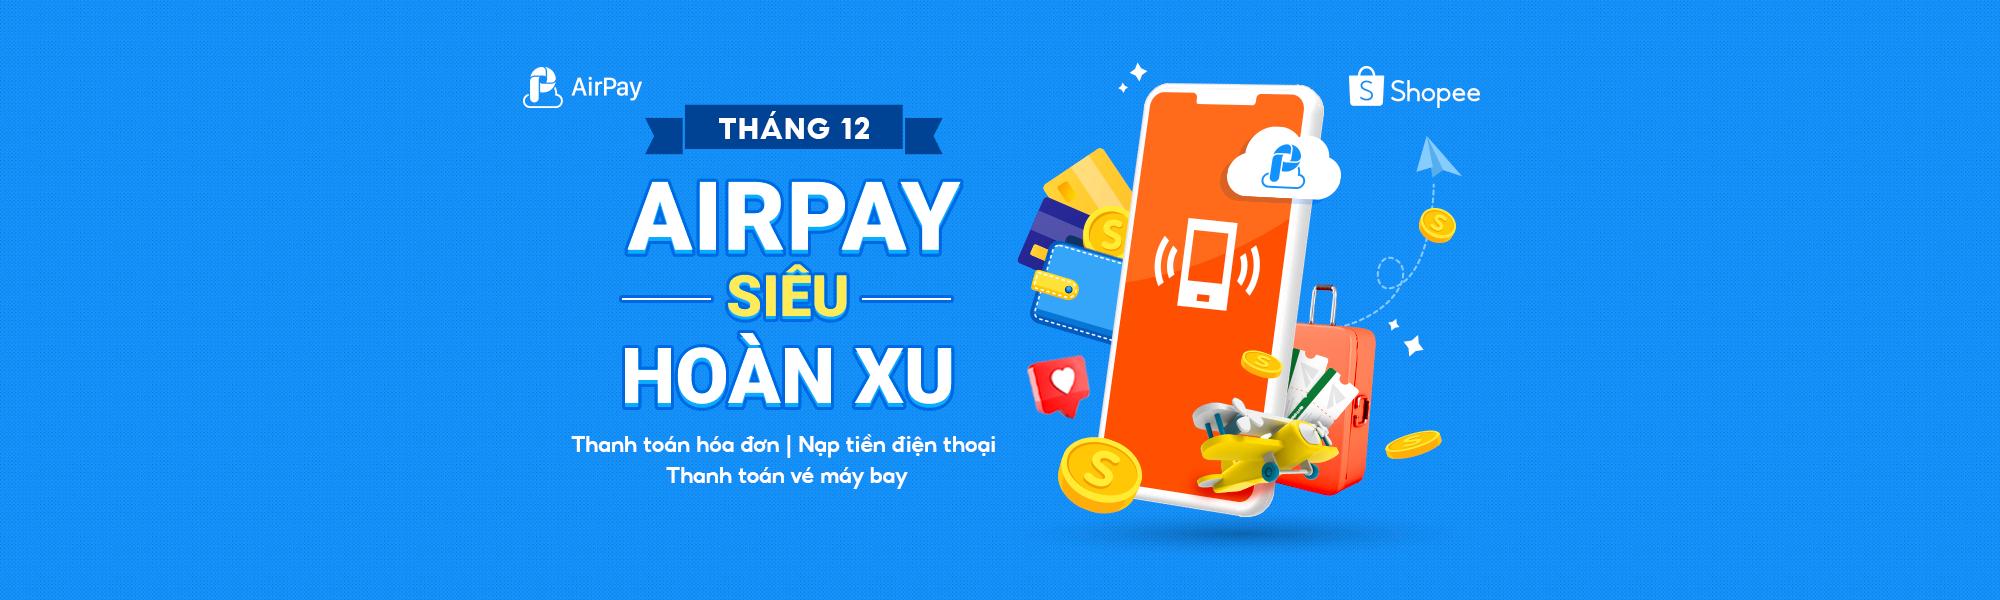 thanh-toan-hoa-don-dien-thoai-may-bay